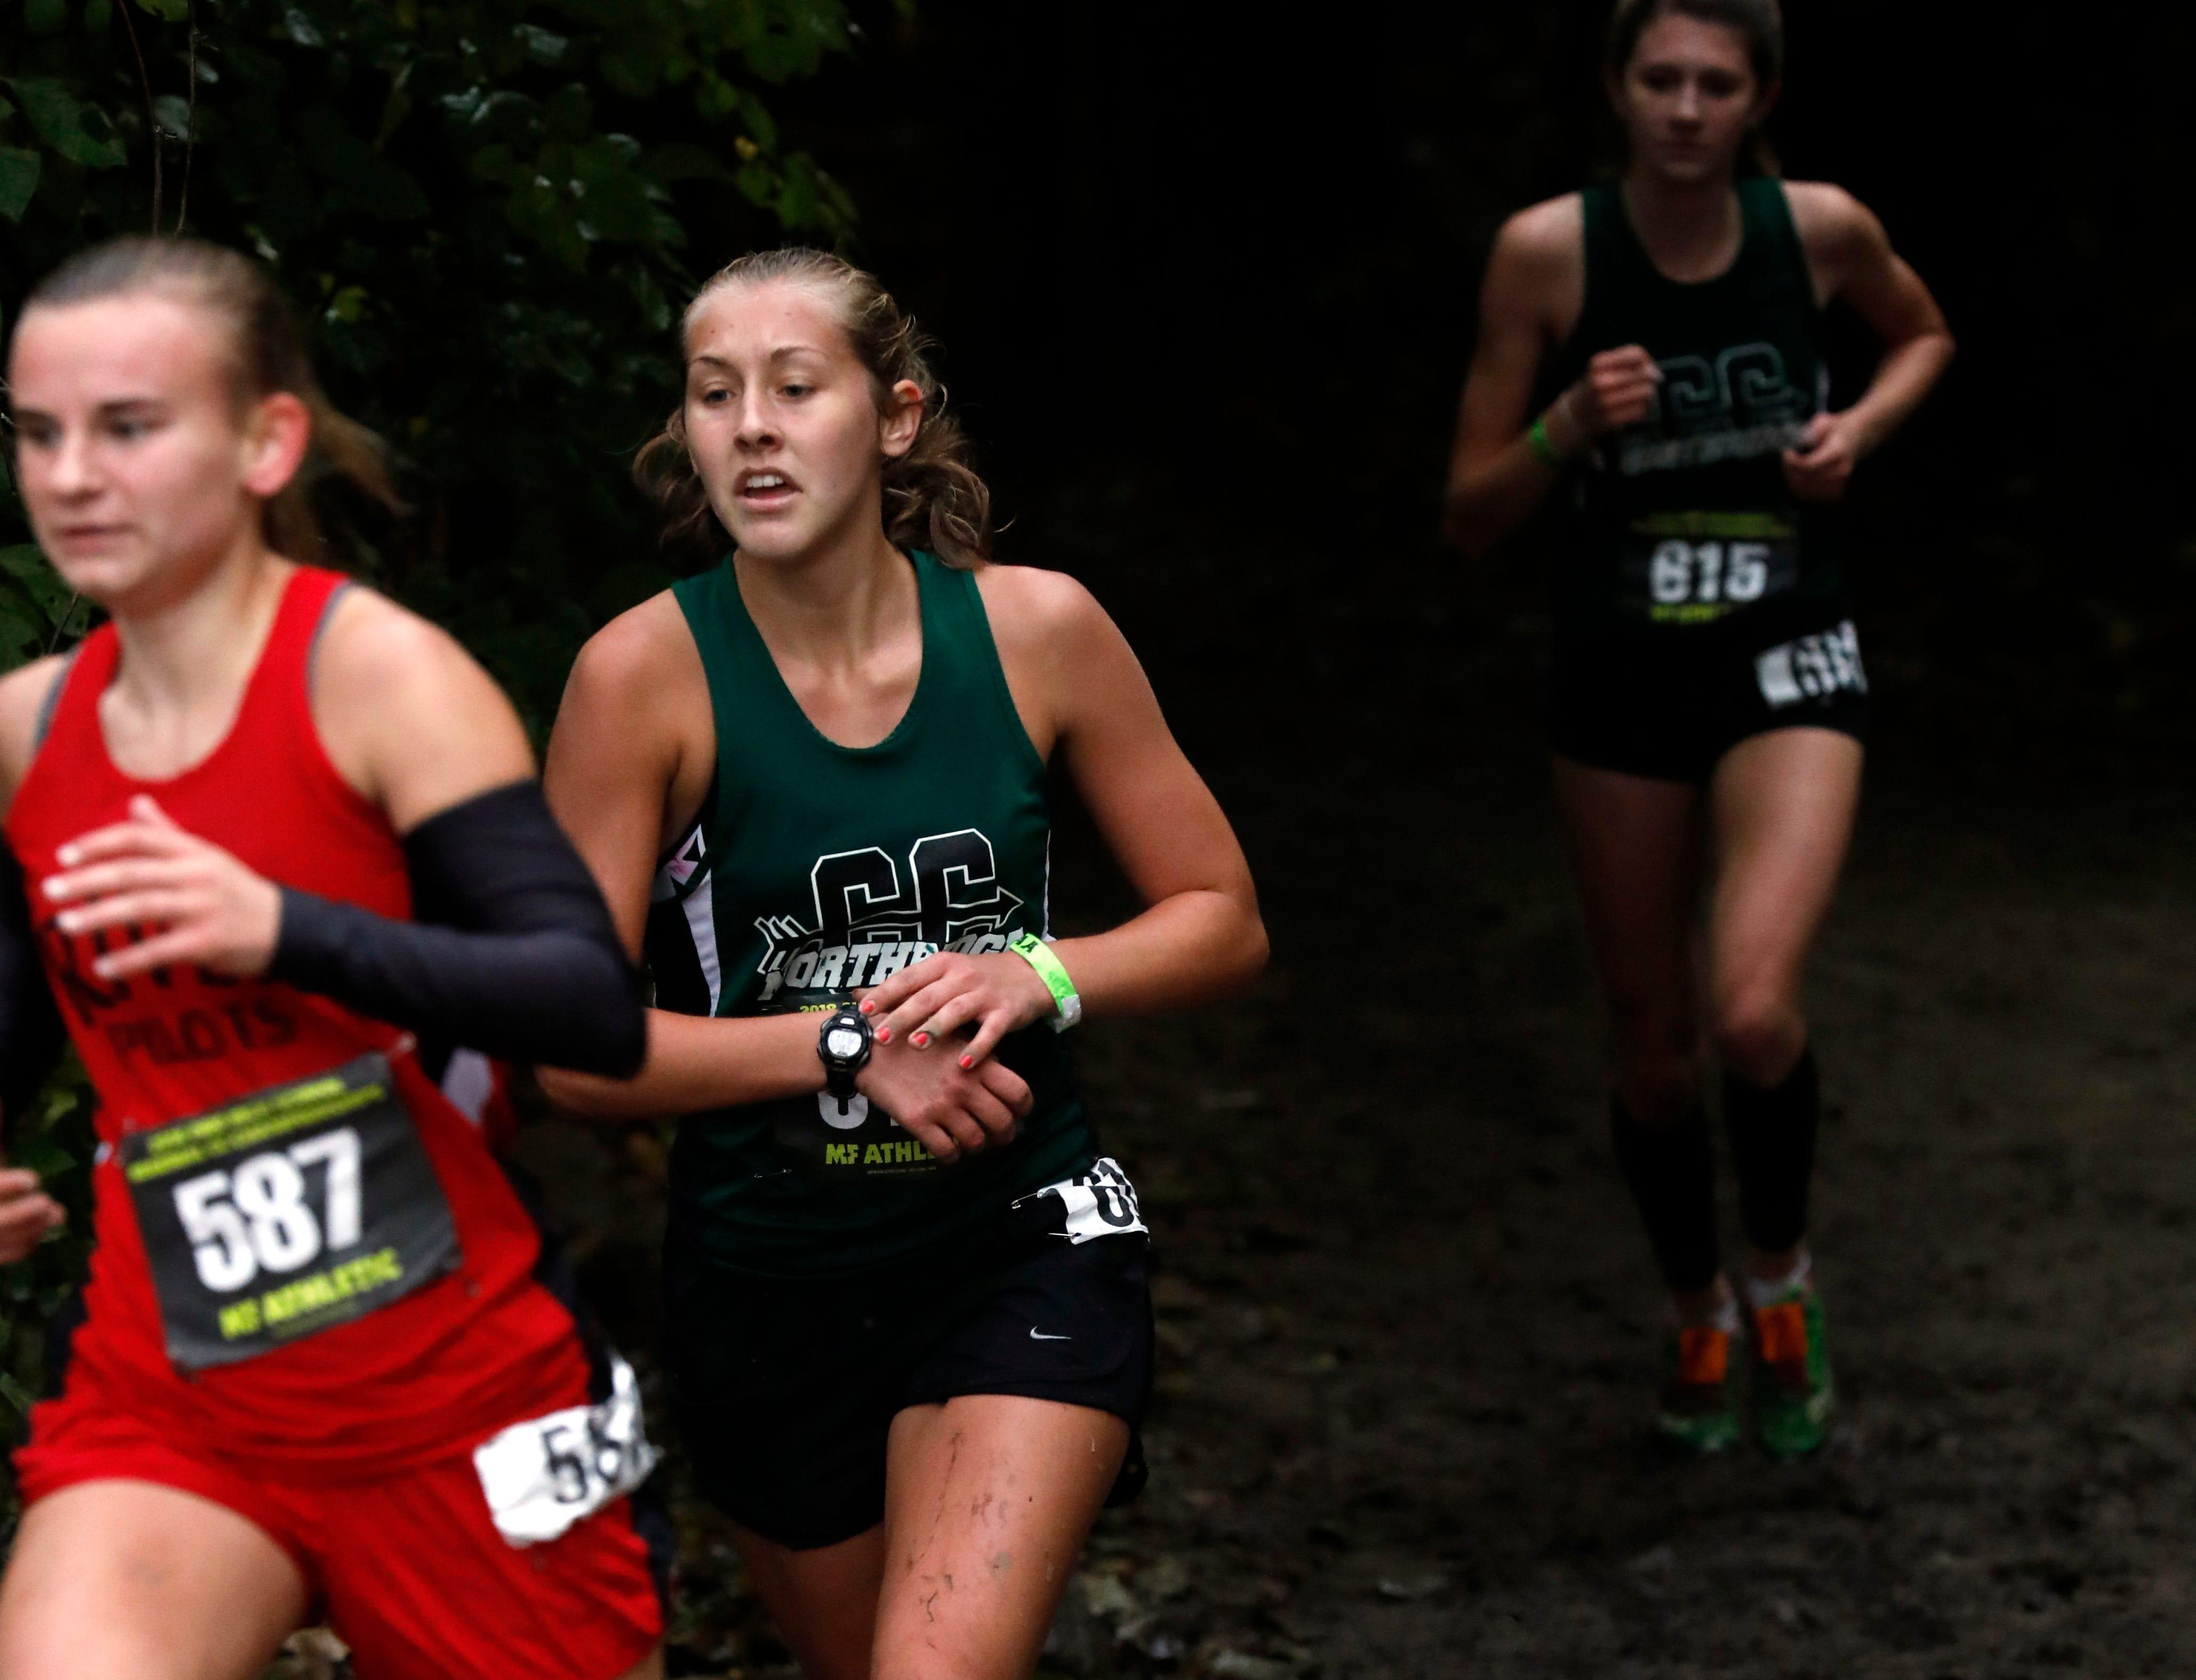 Northridge's Megan King runs in the Regional Cross Country meet Saturday, Oct. 27, 2018, at Pickerington North High School in Pickerington.